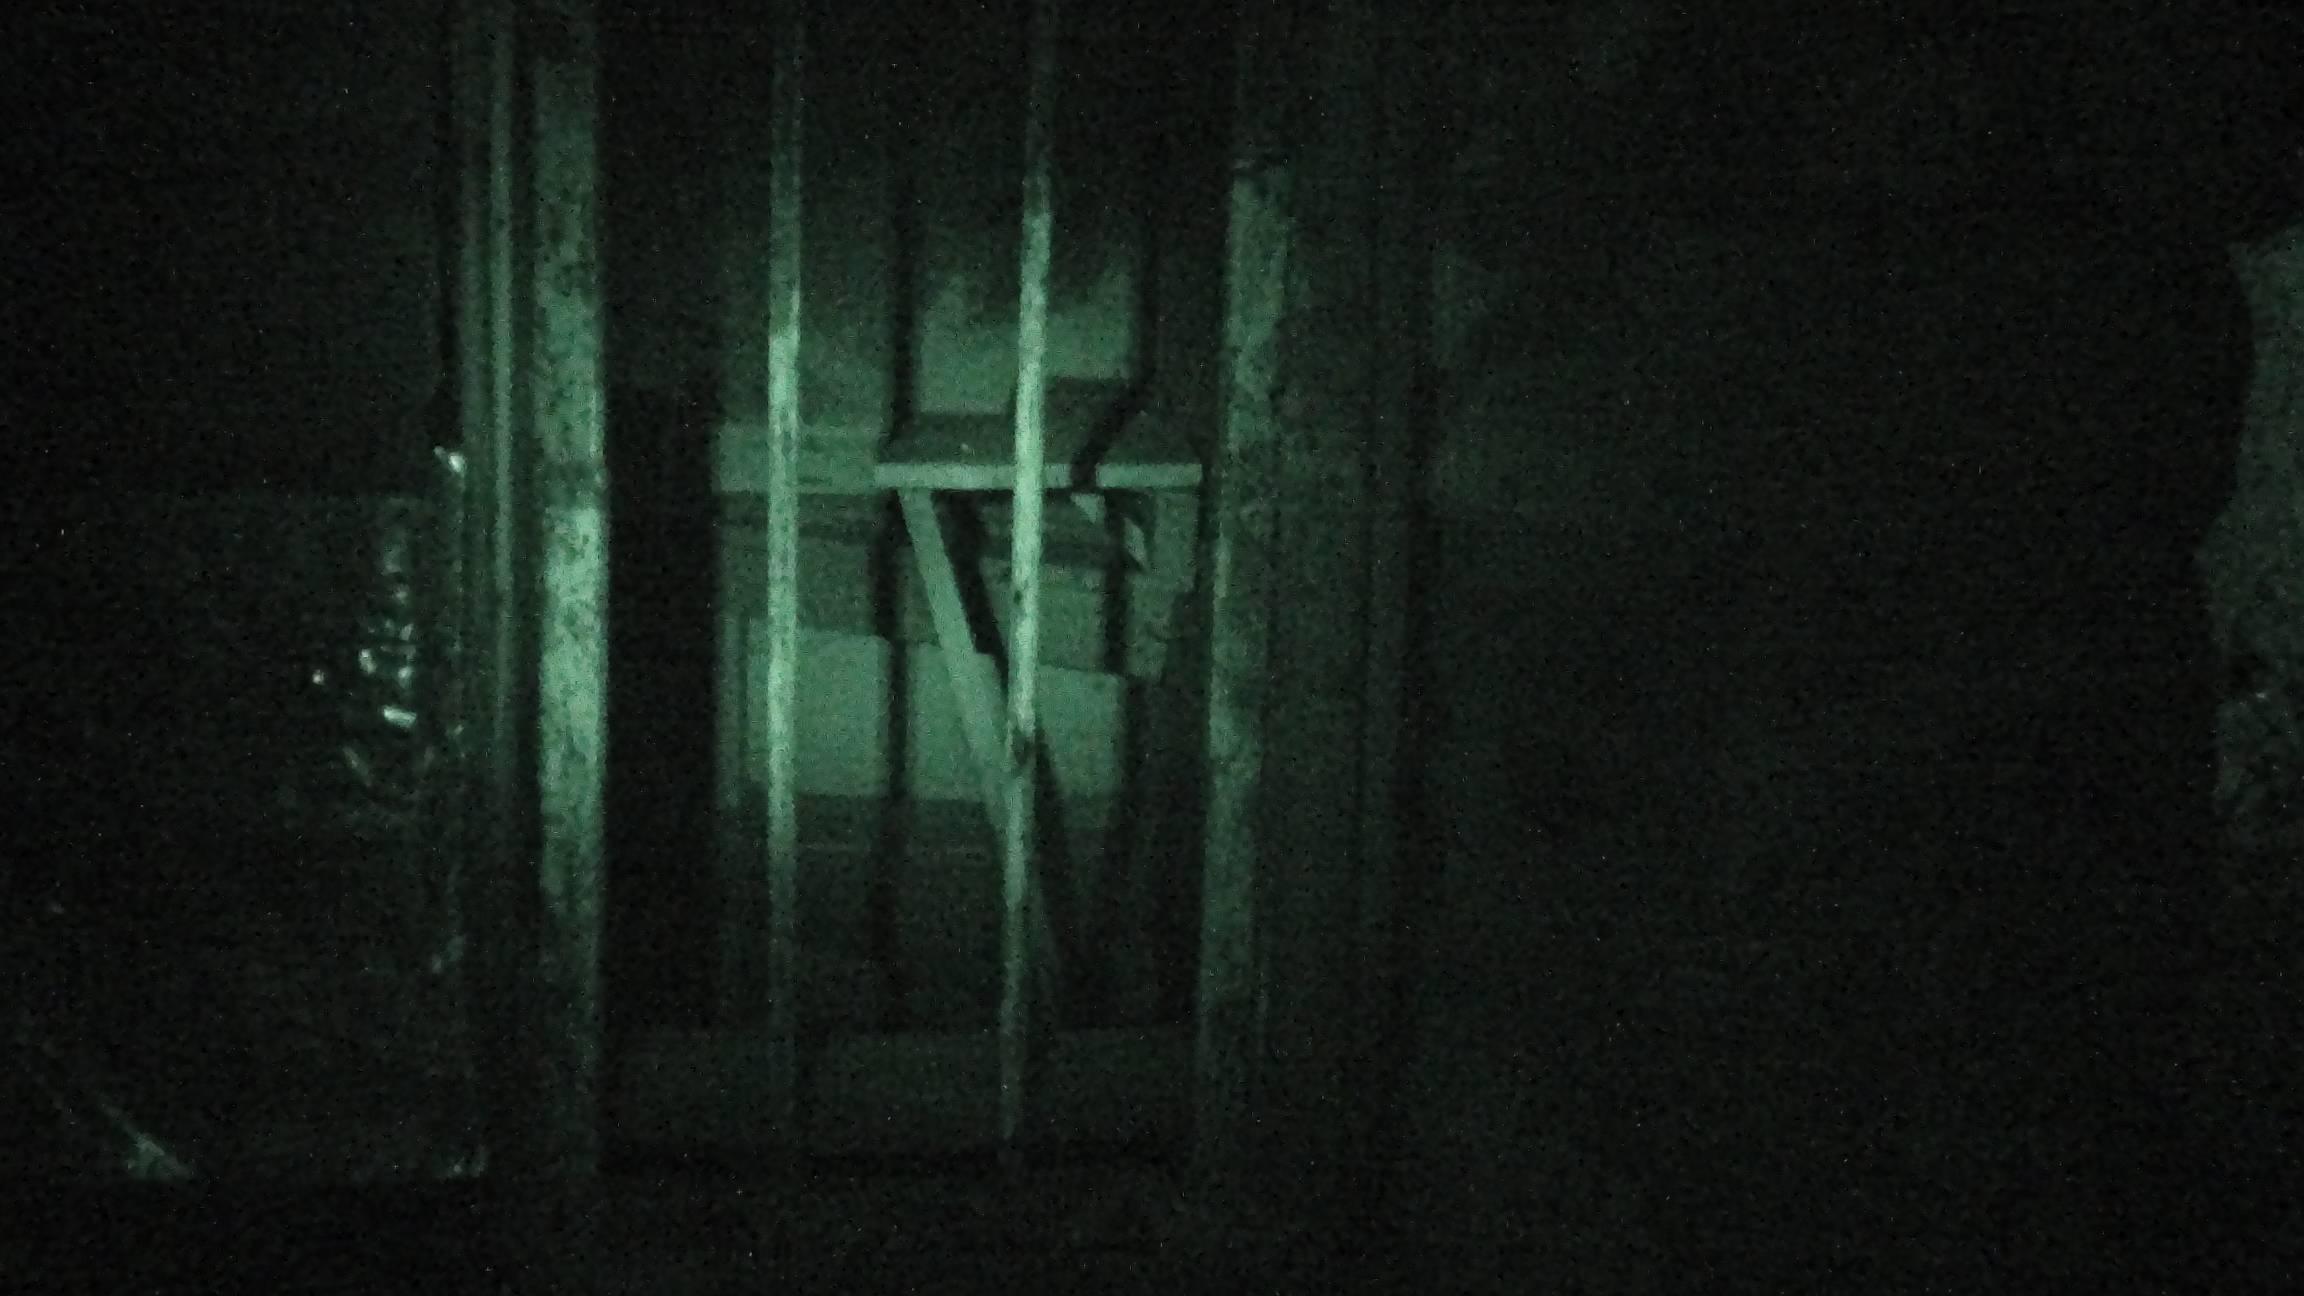 Bullfrog Jail Investigation #2